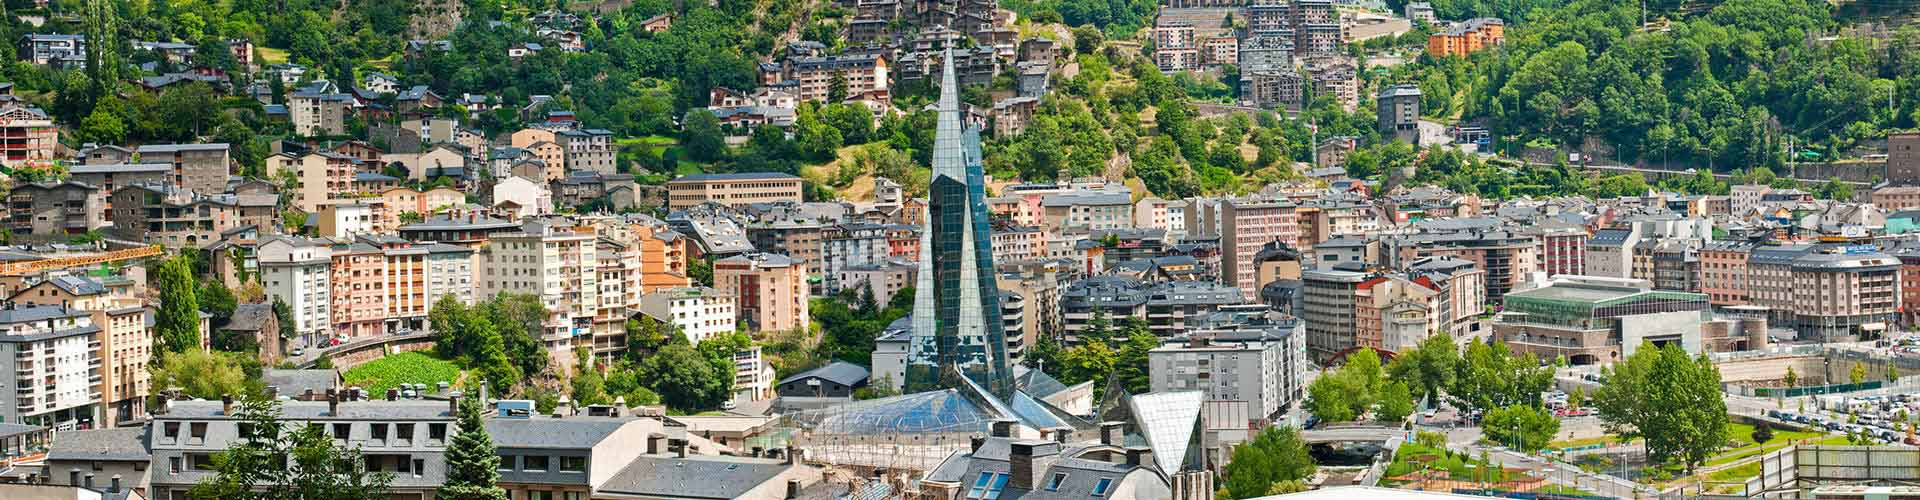 Andorra la Vella - kempování v Andorra la Vella. Mapy pro Andorra la Vella, fotky a recenze pro všechno kempování - Andorra la Vella.